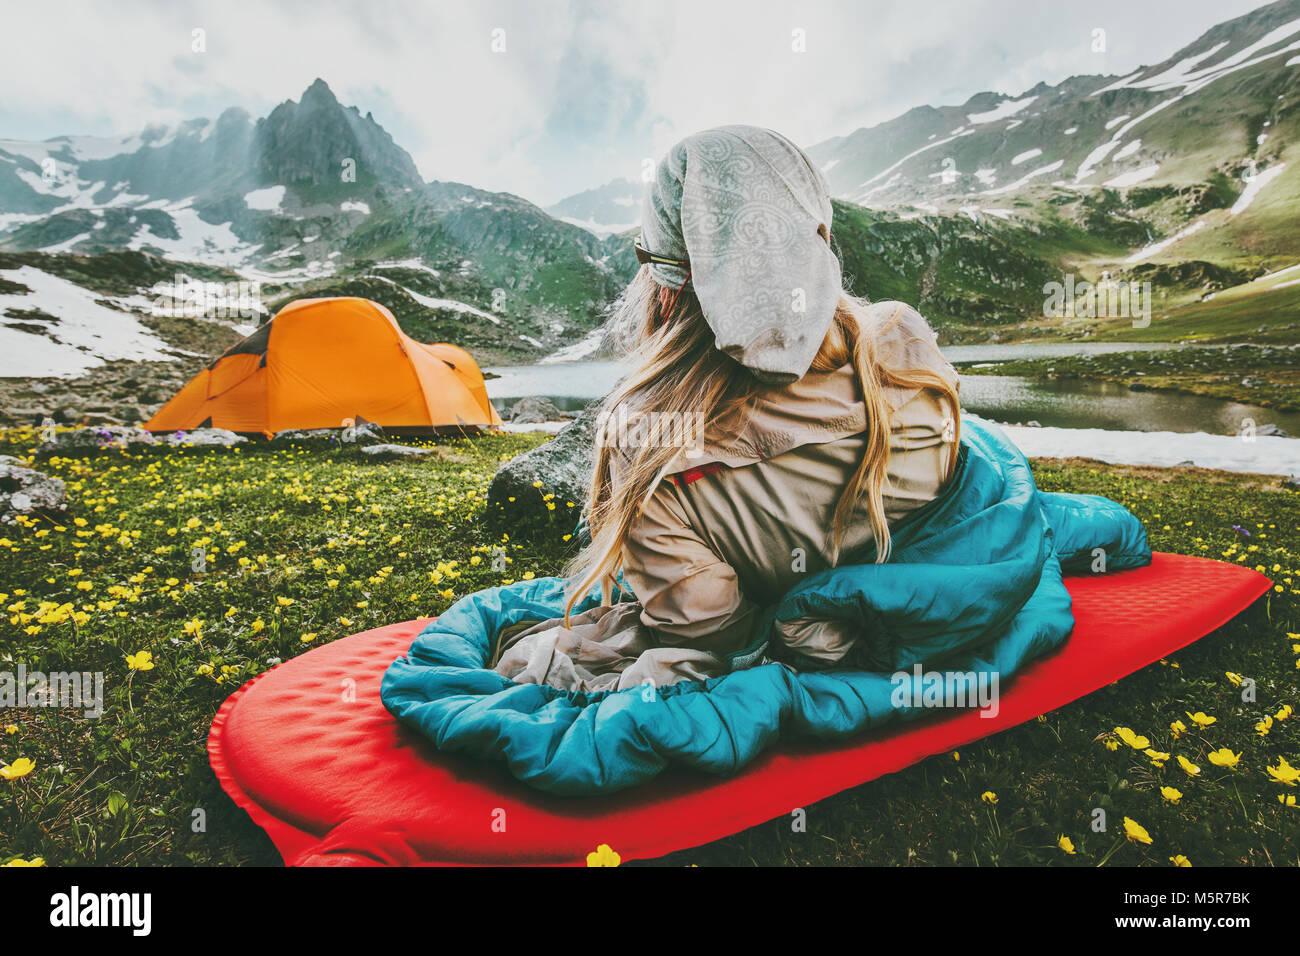 Woman relaxing in sac de couchage sur tapis rouge camping vacances voyage en montagne week-end aventure concept Photo Stock